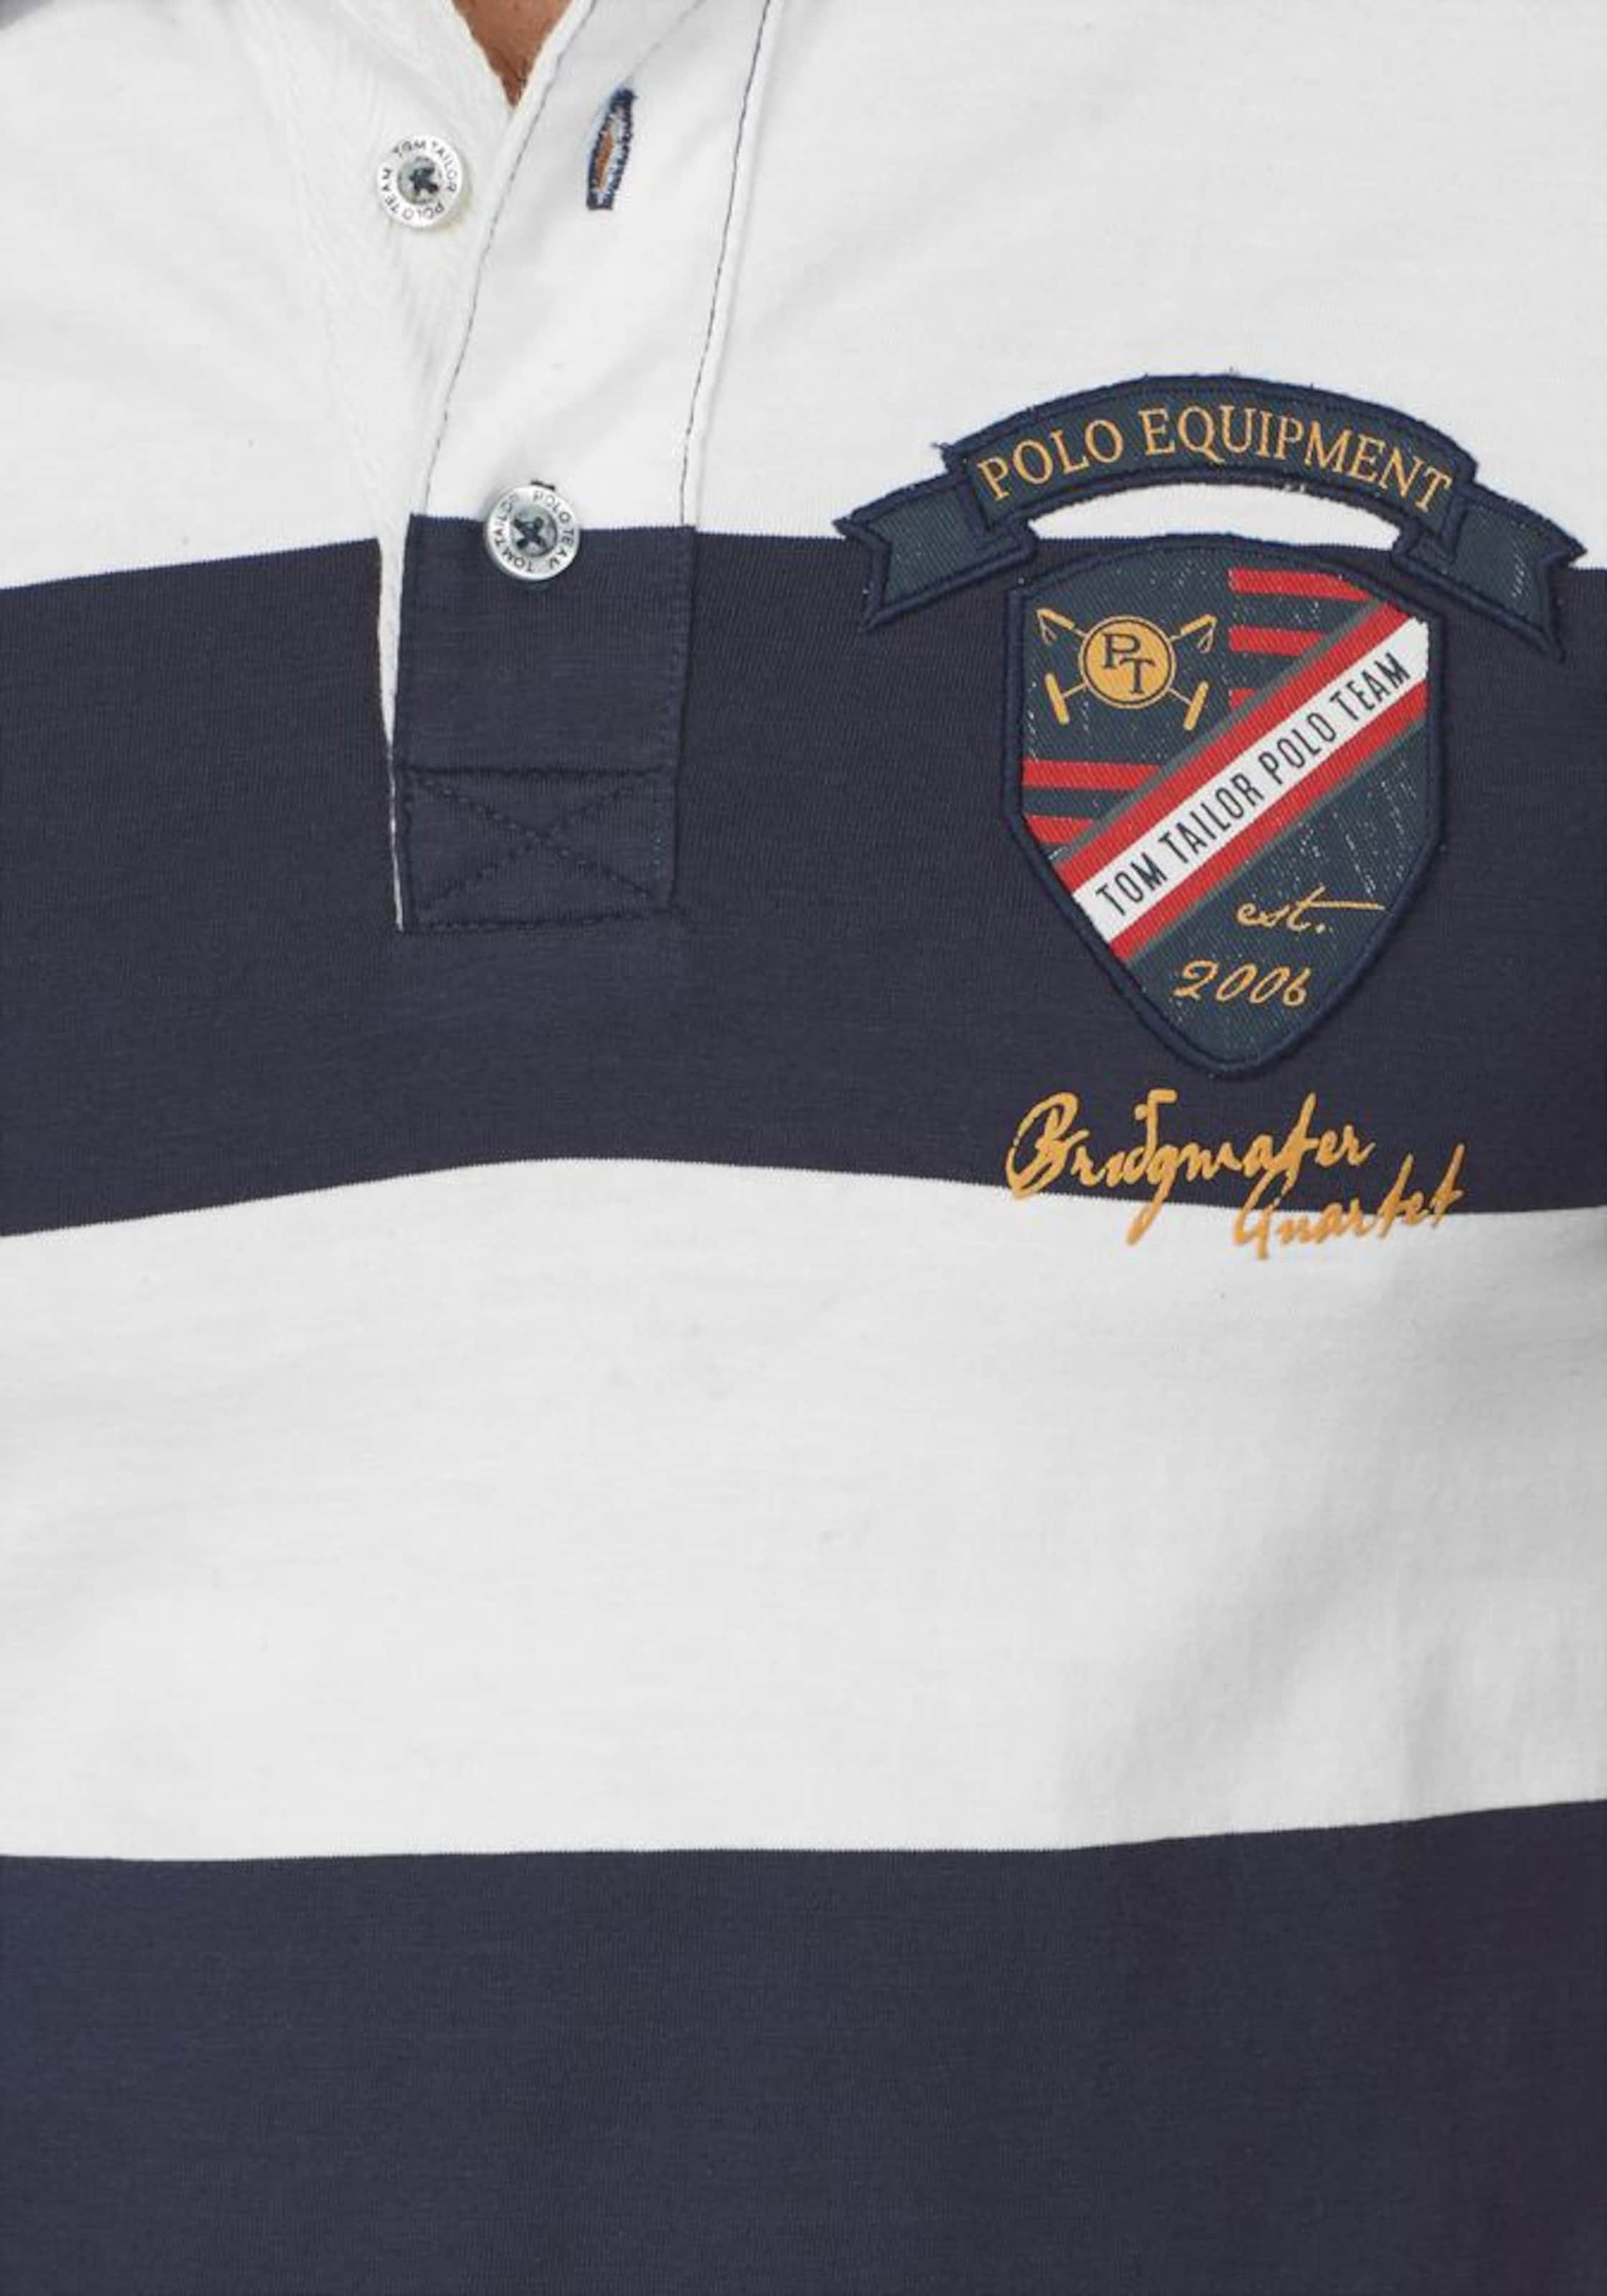 TOM TAILOR Polo Team Poloshirt Ansehen Günstig Online Verkauf 2018 Neueste IFNoNgtLOp